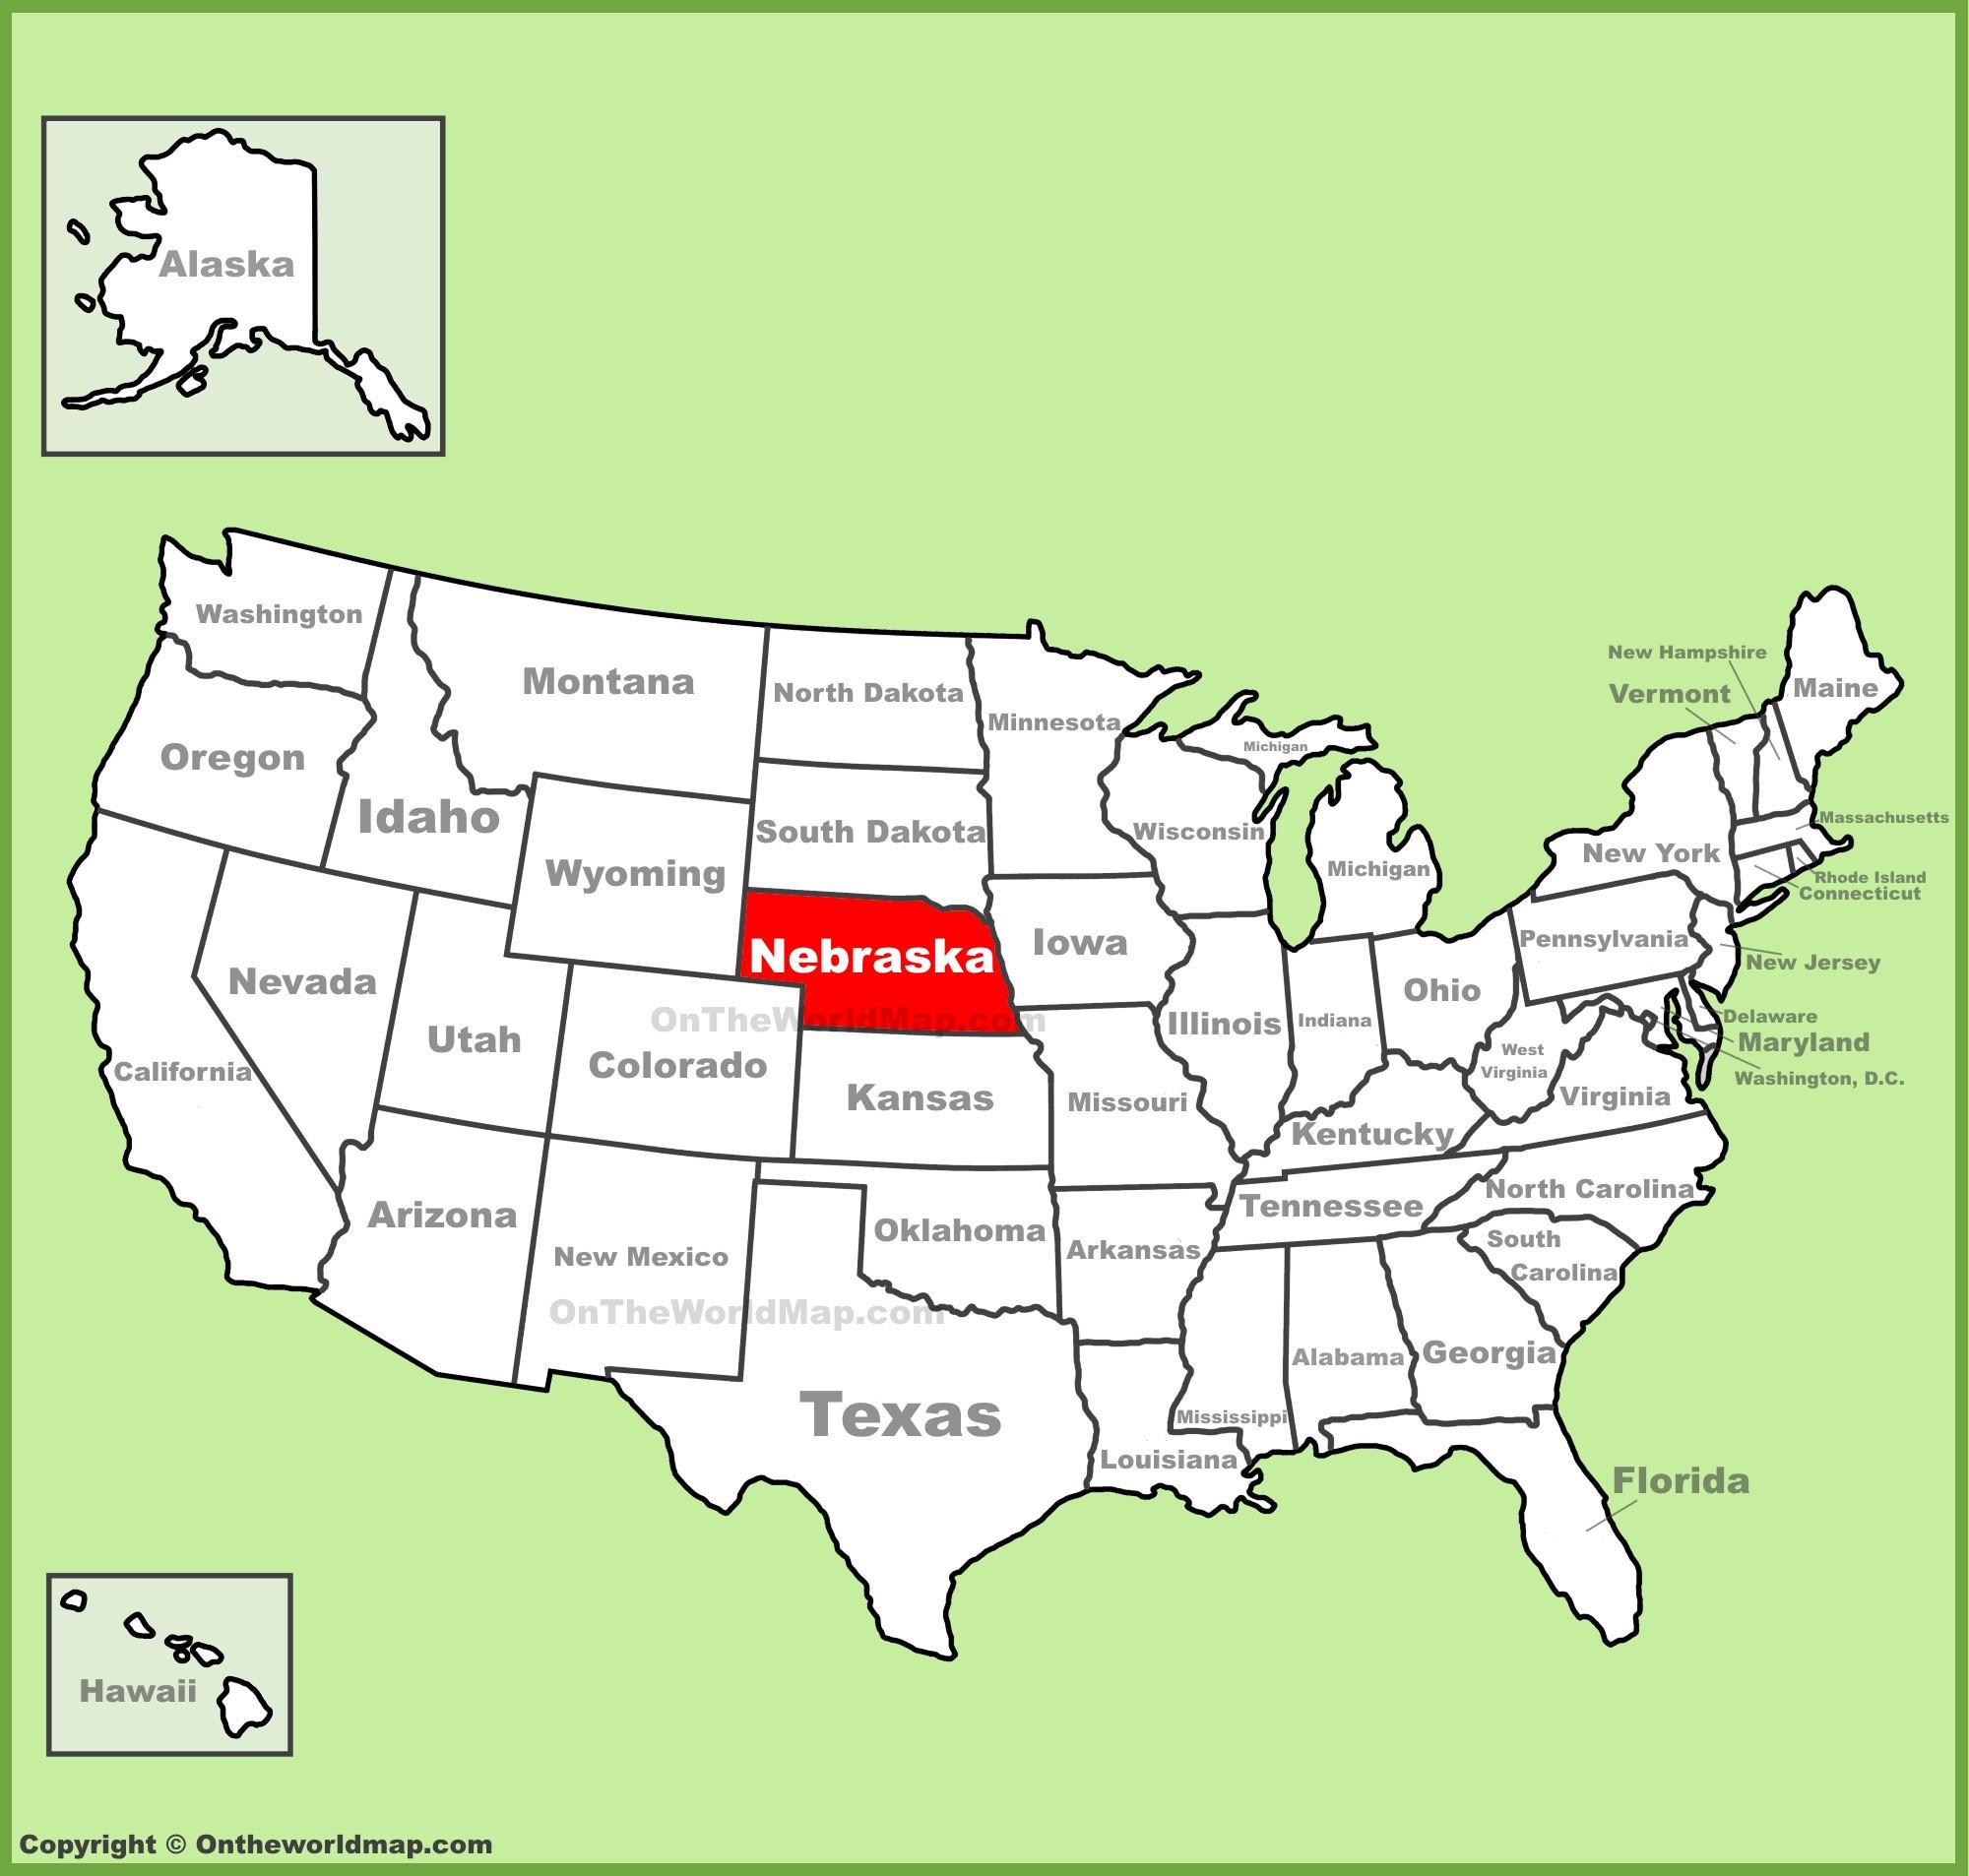 Map Of Mission Viejo California Fresh Las Vegas California Map - Mission Viejo California Map